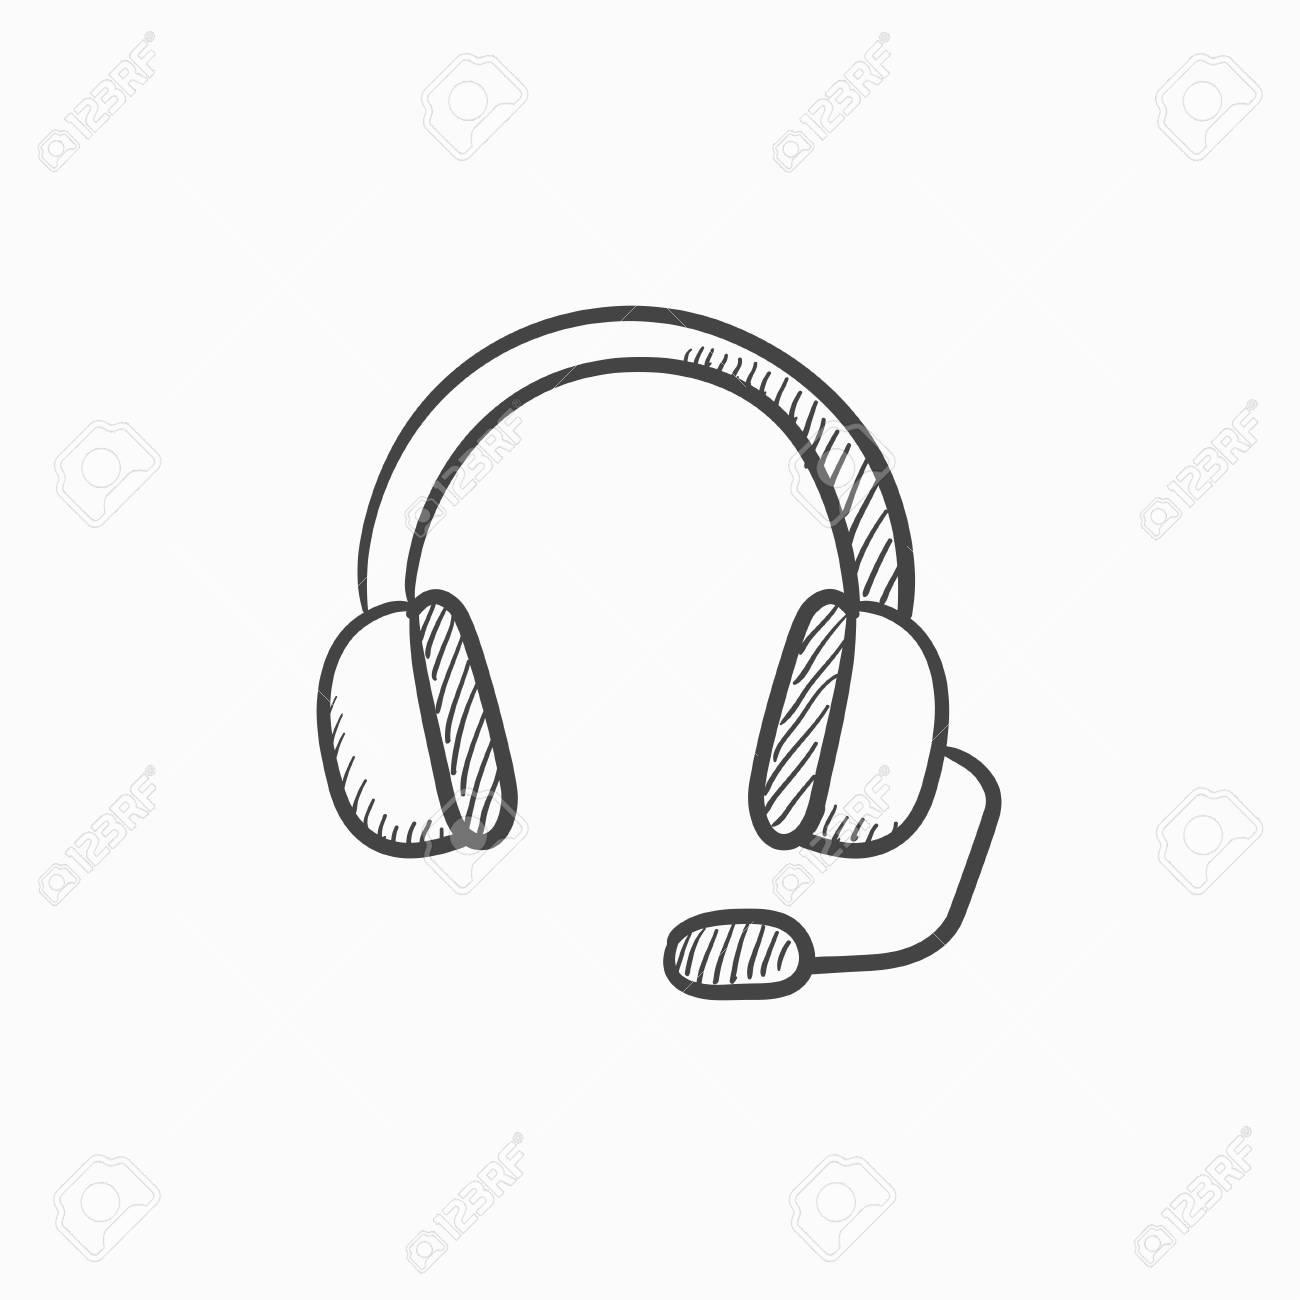 Kopfhorer Mit Mikrofon Vektor Skizze Symbol Isoliert Auf Den